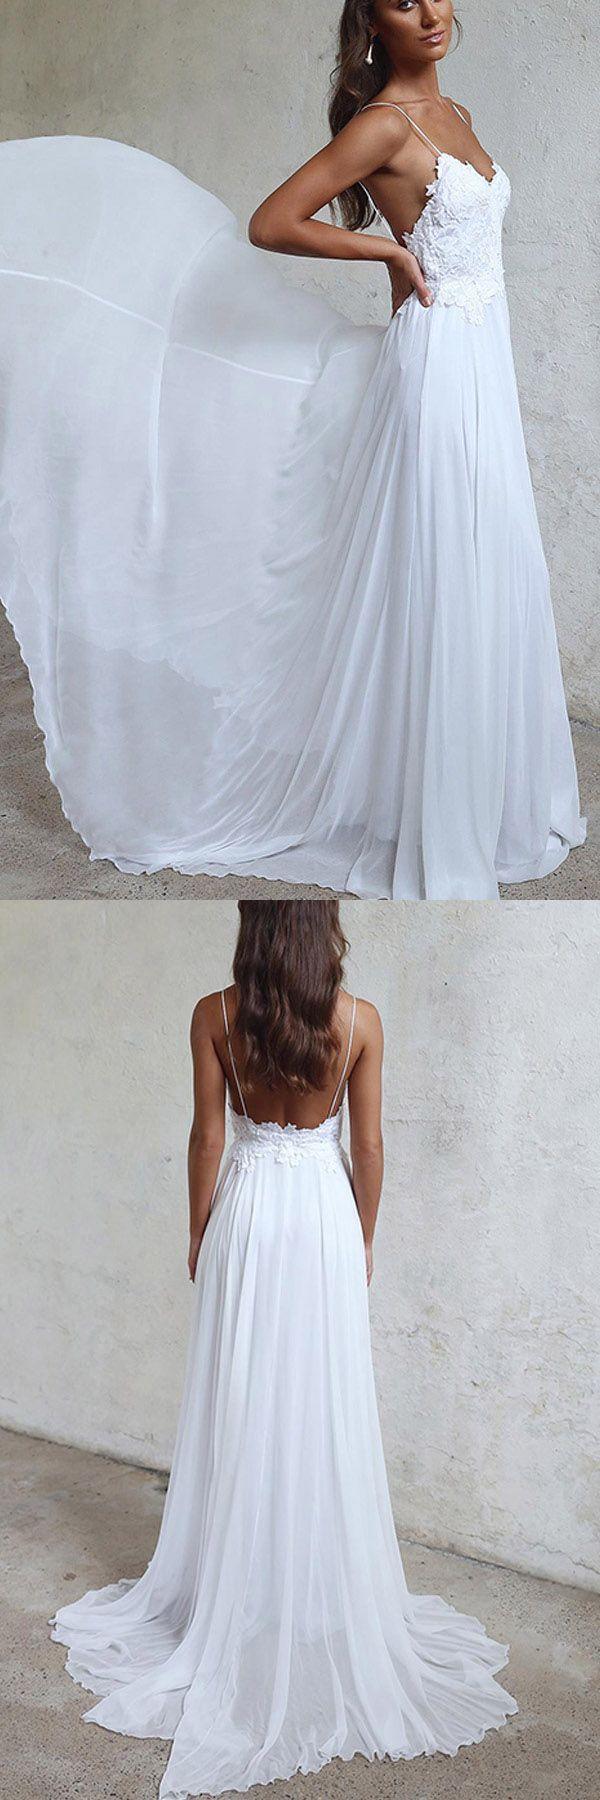 Elegant A-line Straps White Long Chiffon Beach Wedding Dress WD102;Wedding Dresses,Bridal Gown